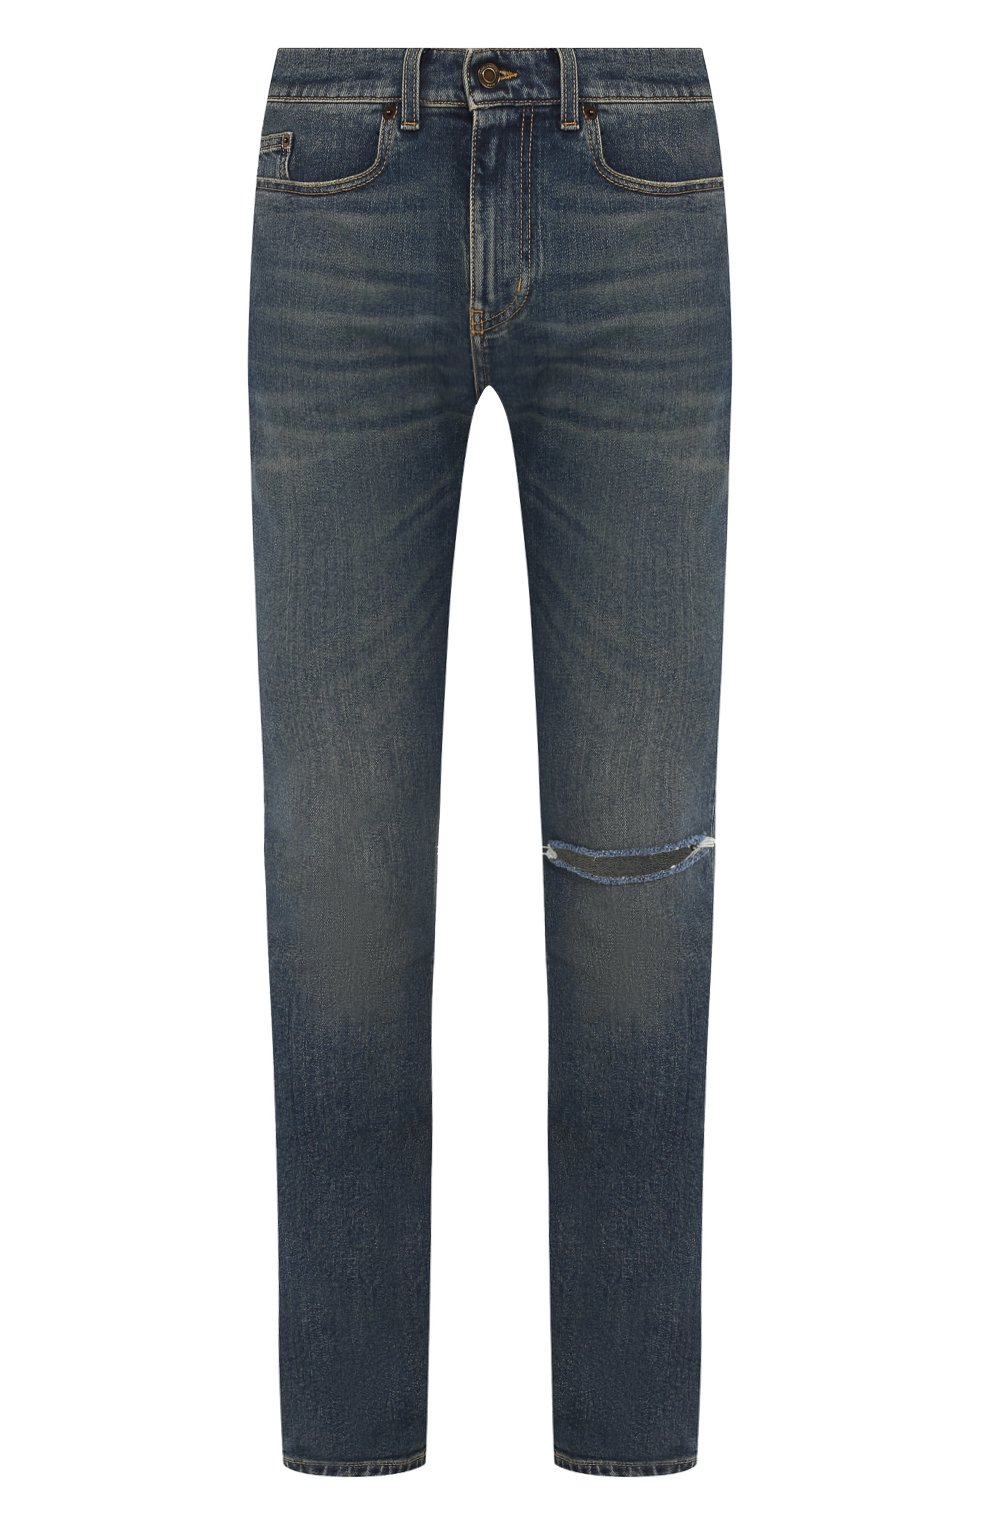 Мужские джинсы SAINT LAURENT темно-синего цвета, арт. 587035/YD964 | Фото 1